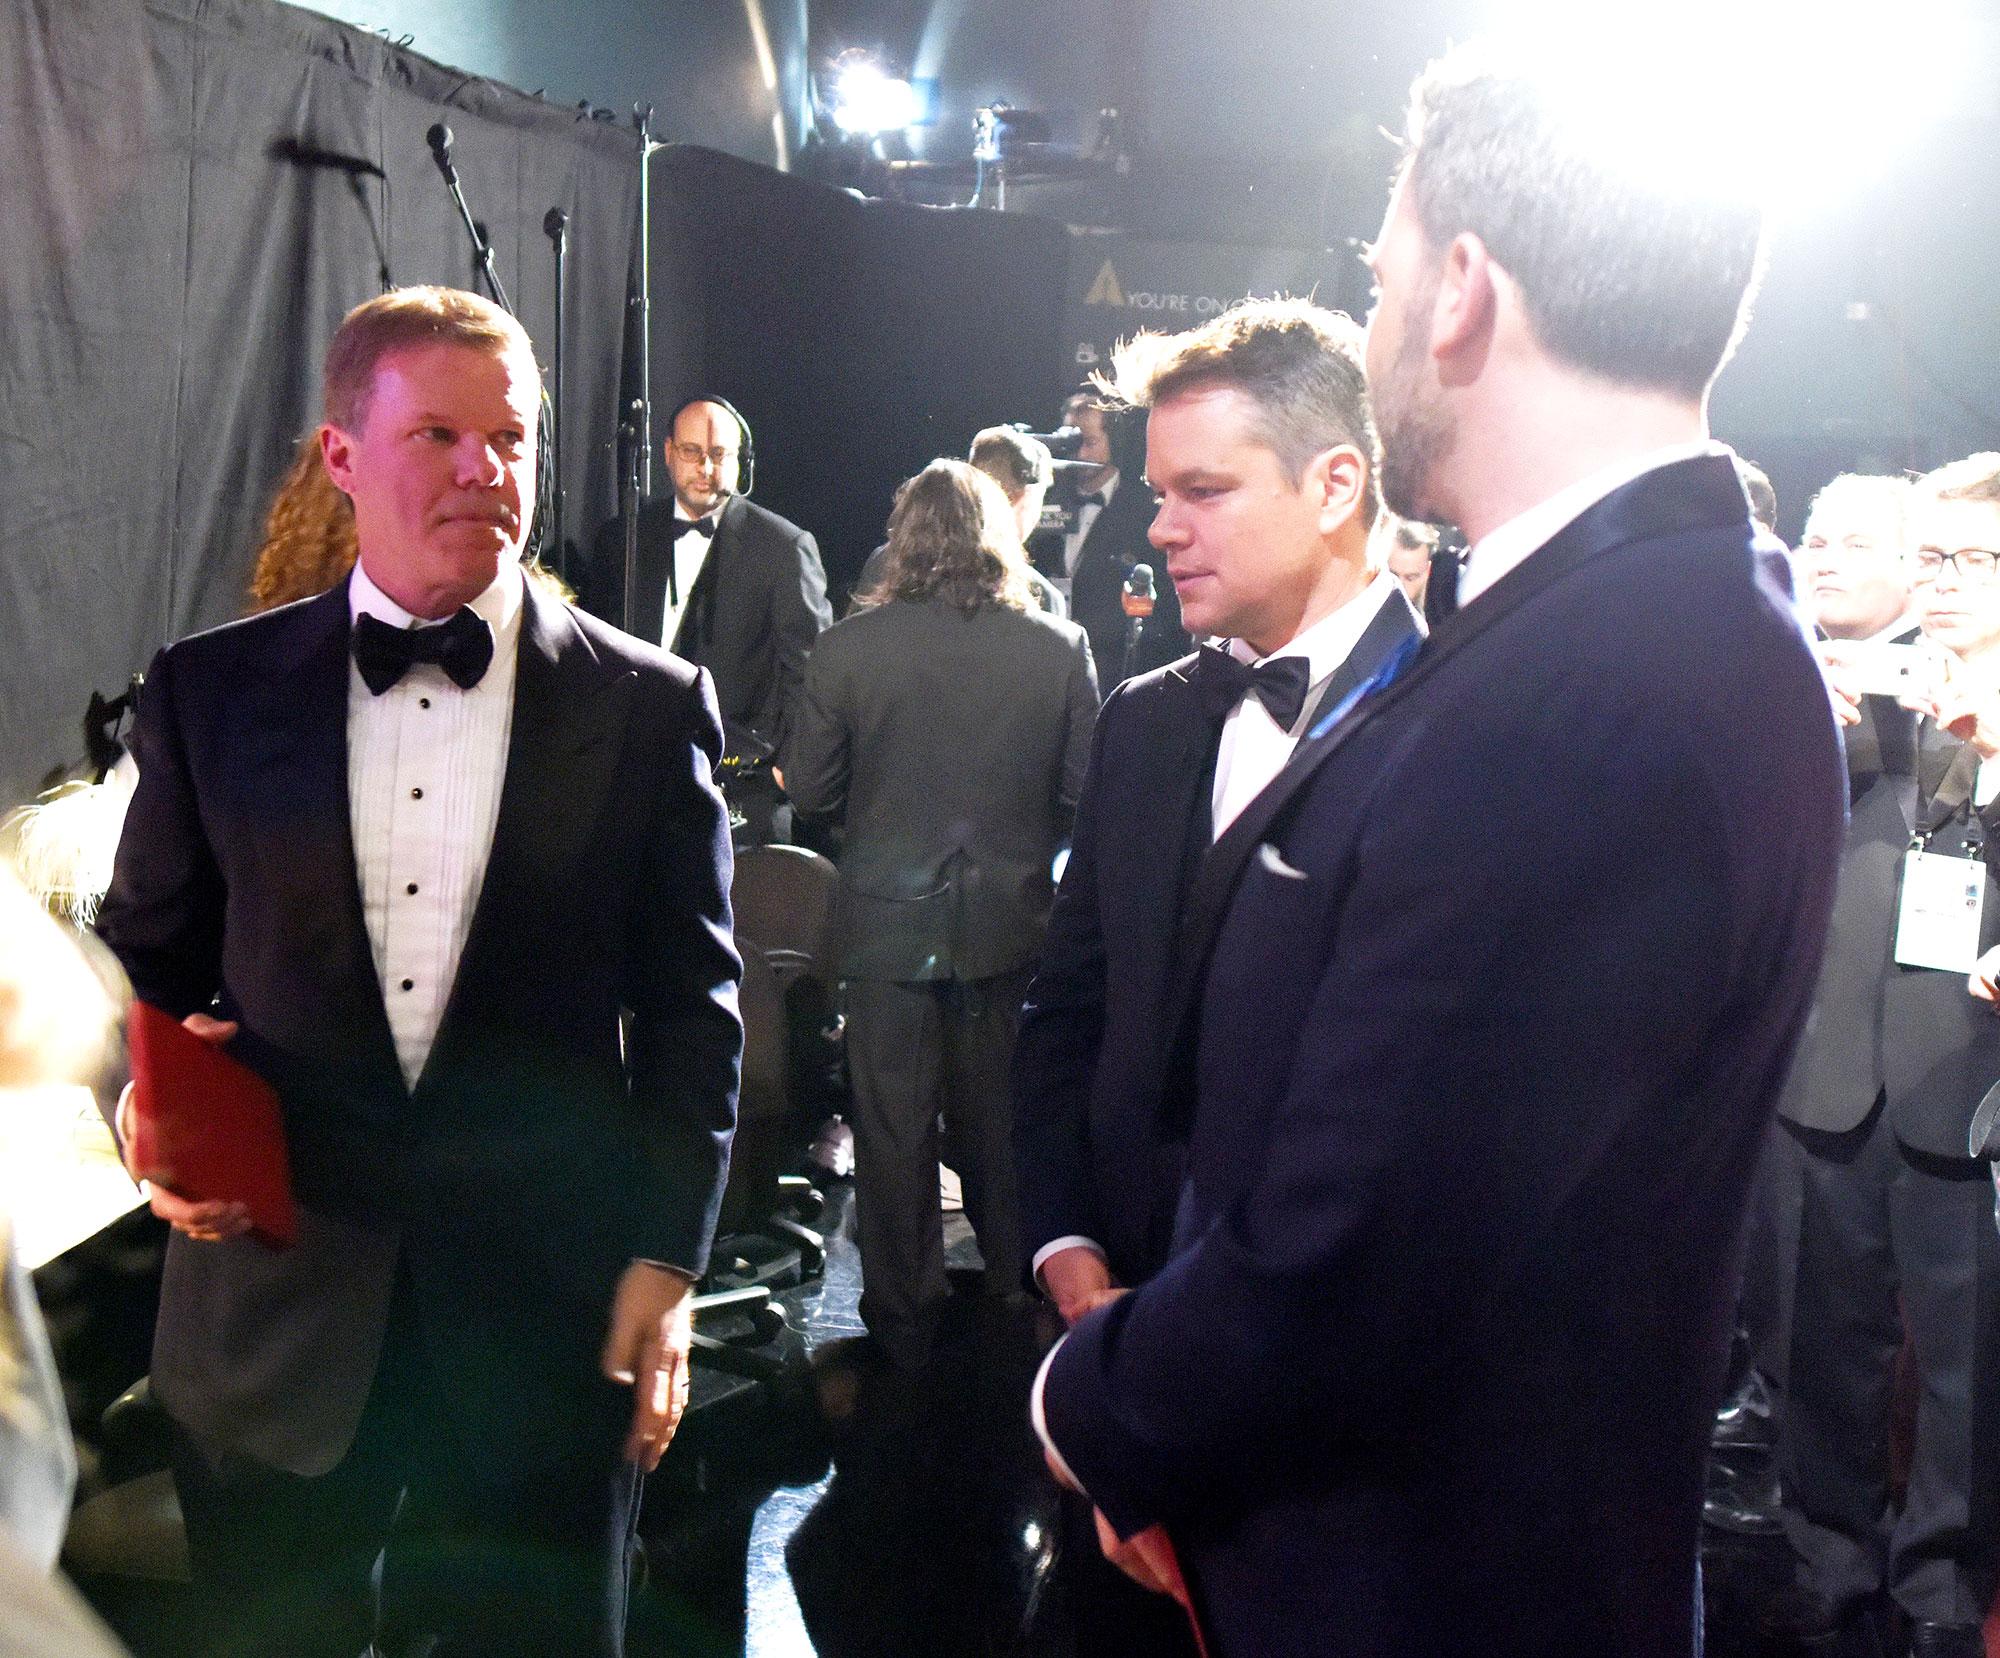 Brian Cullinan, Matt Damon and Ben Affleck backstage